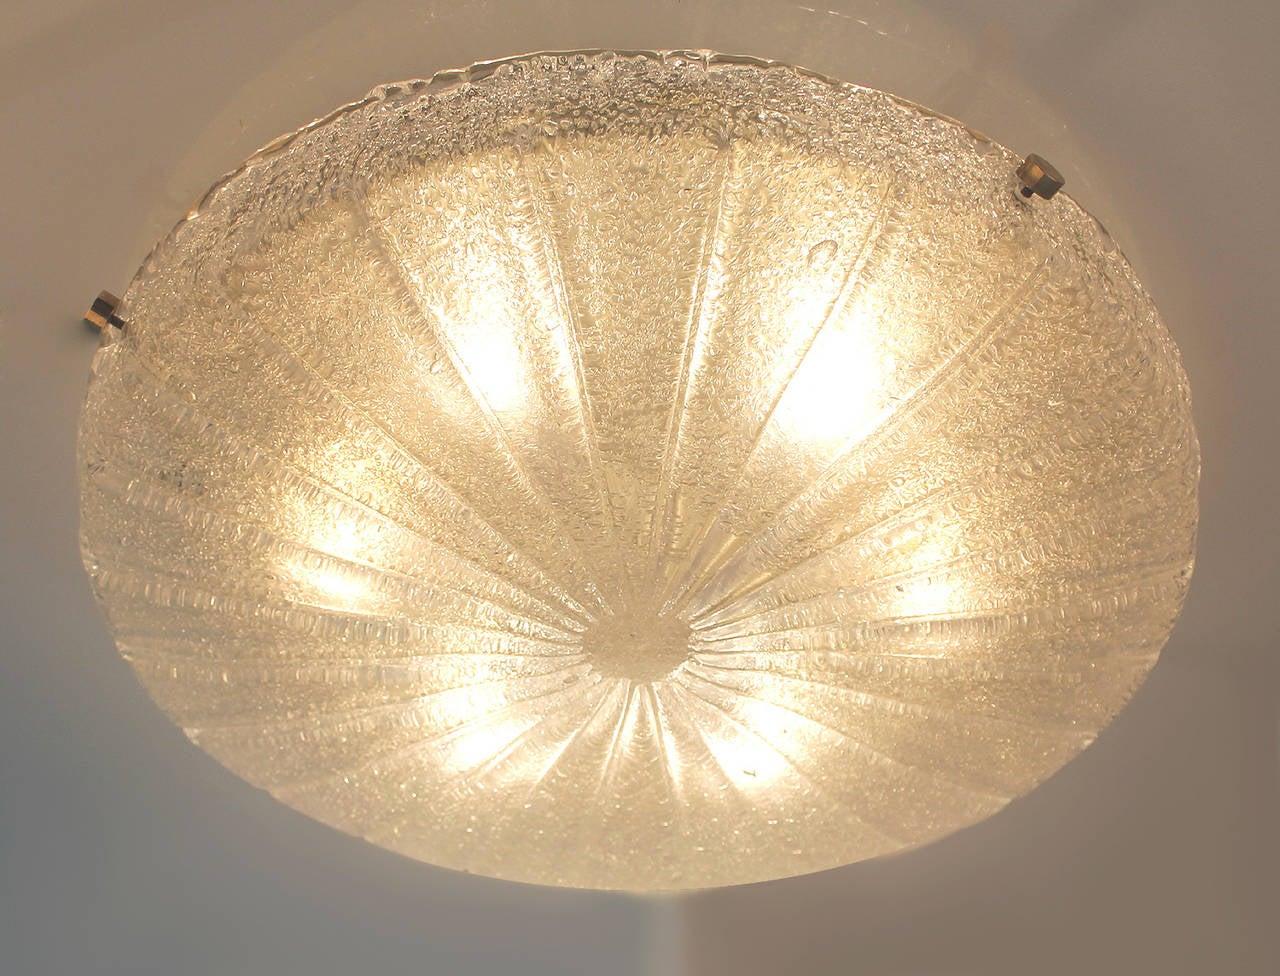 Murano Glass Ceiling Light Fixtures Light Fixtures